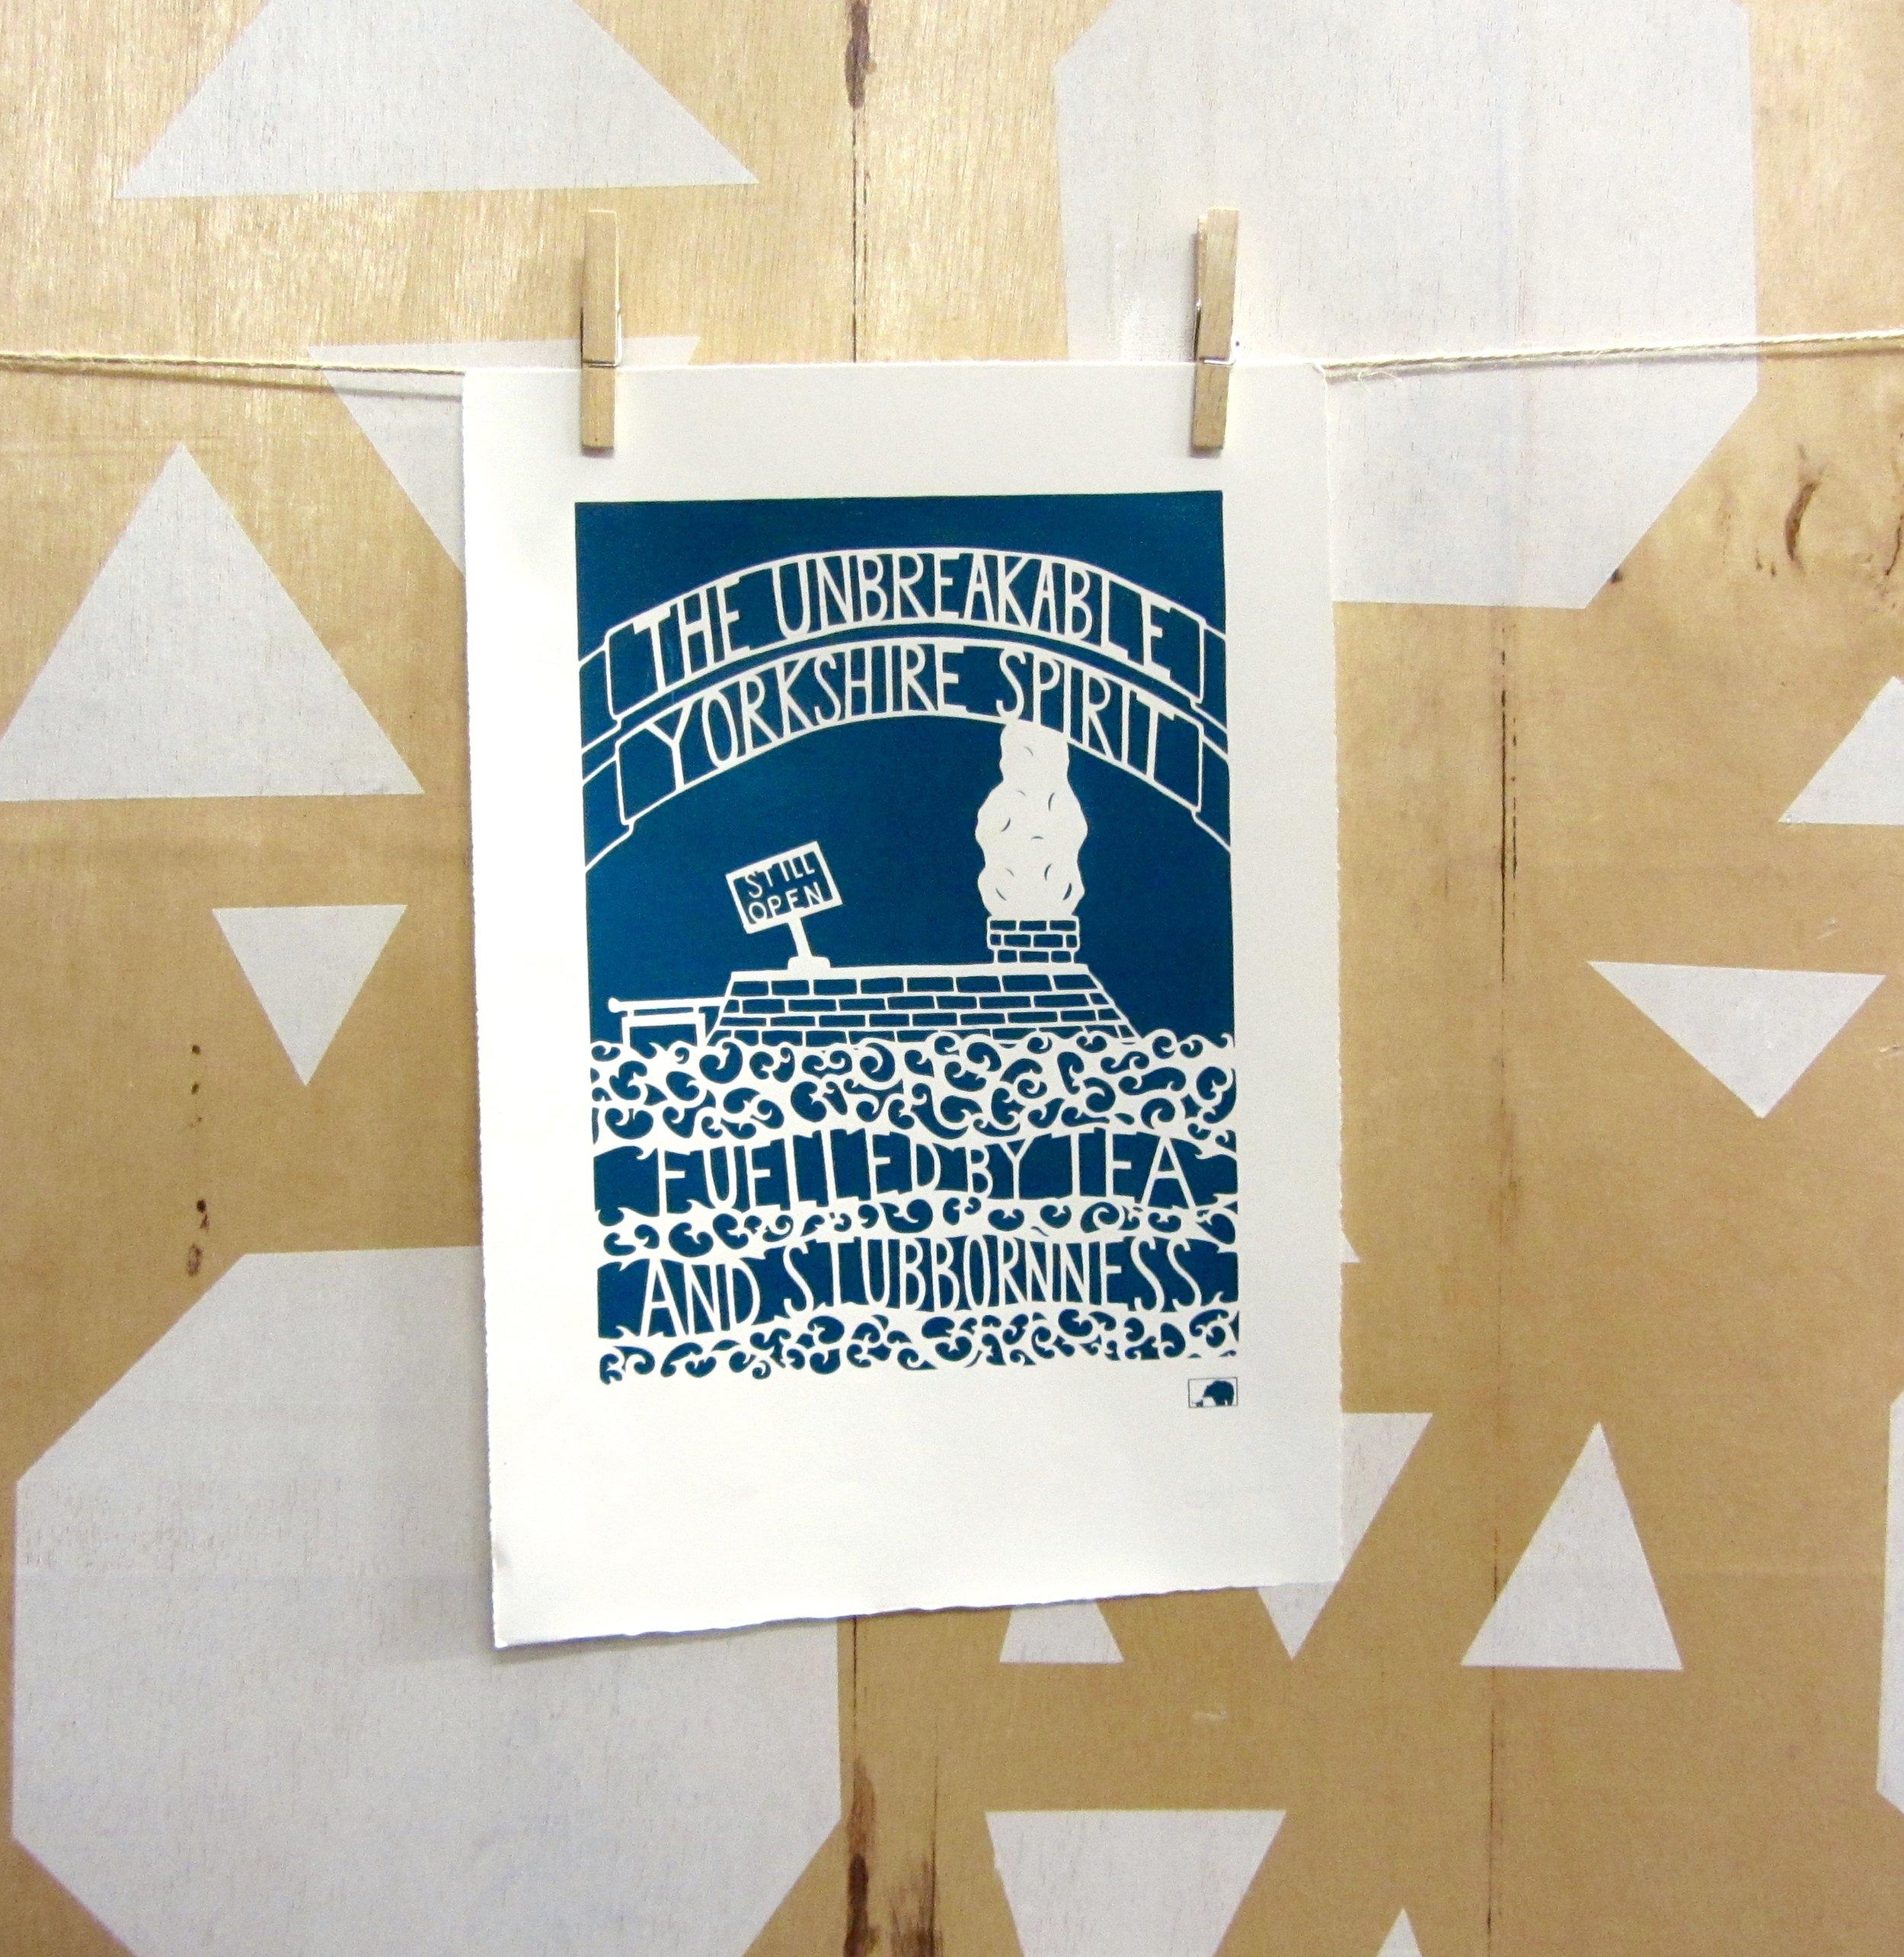 artist screen printing